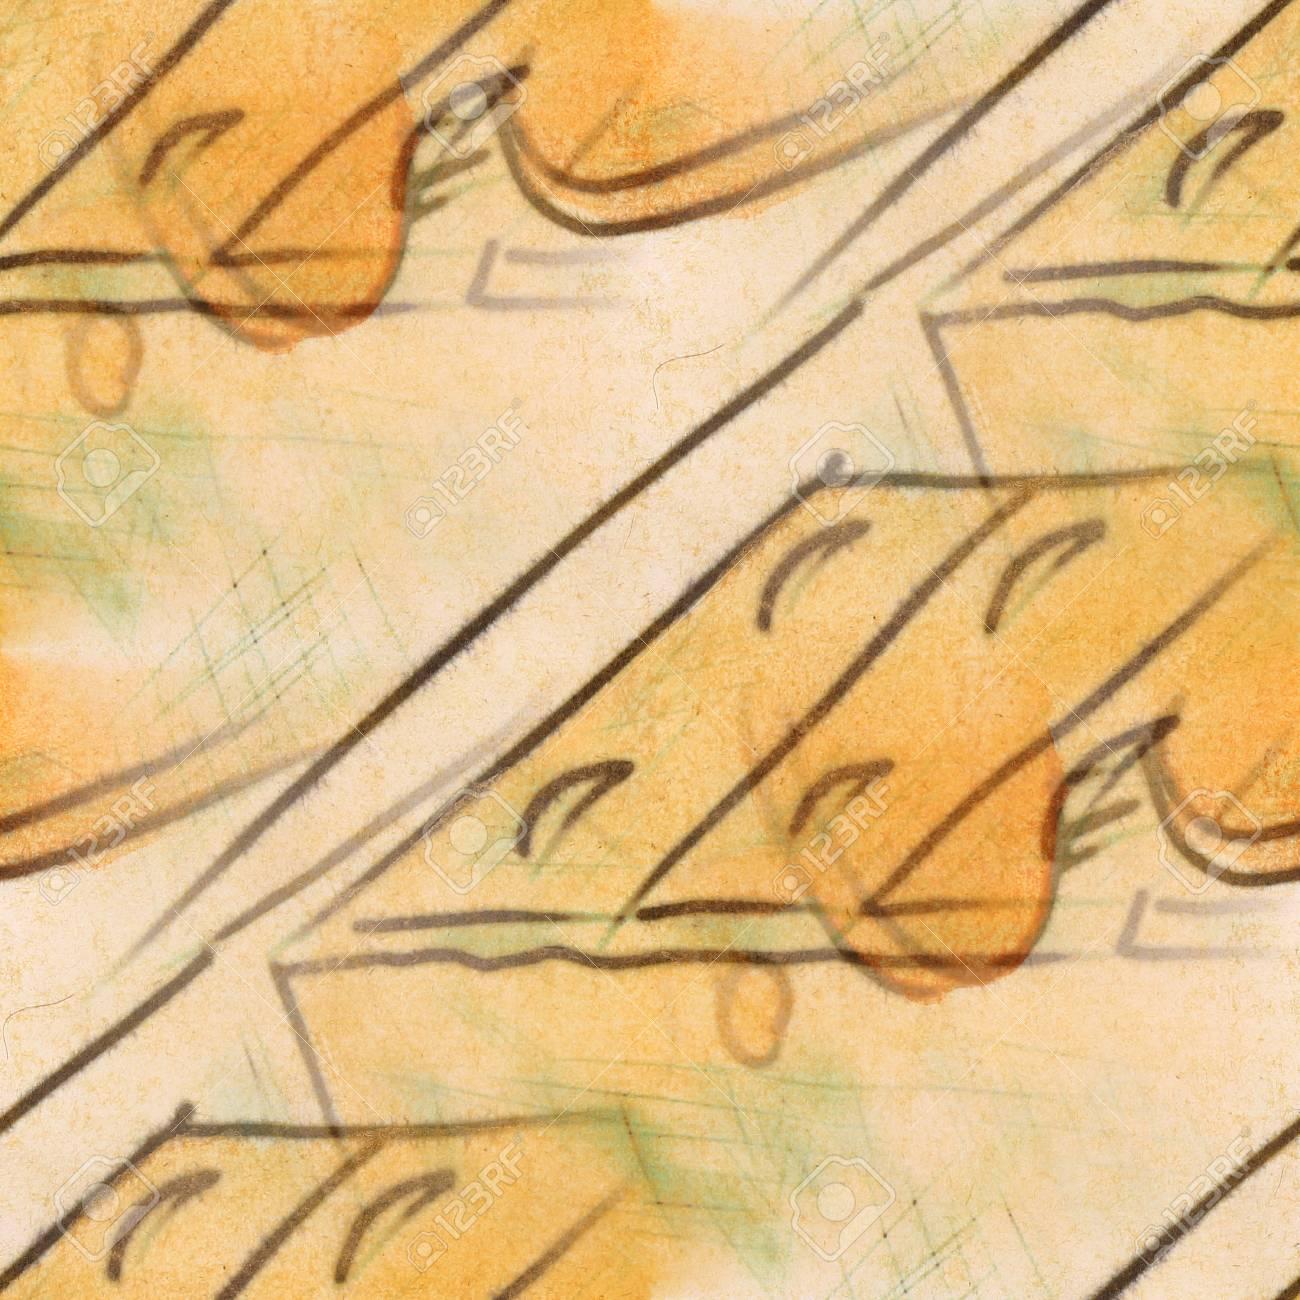 Seamless Light Brown Cabinet Figures Texture Background Wallpaper